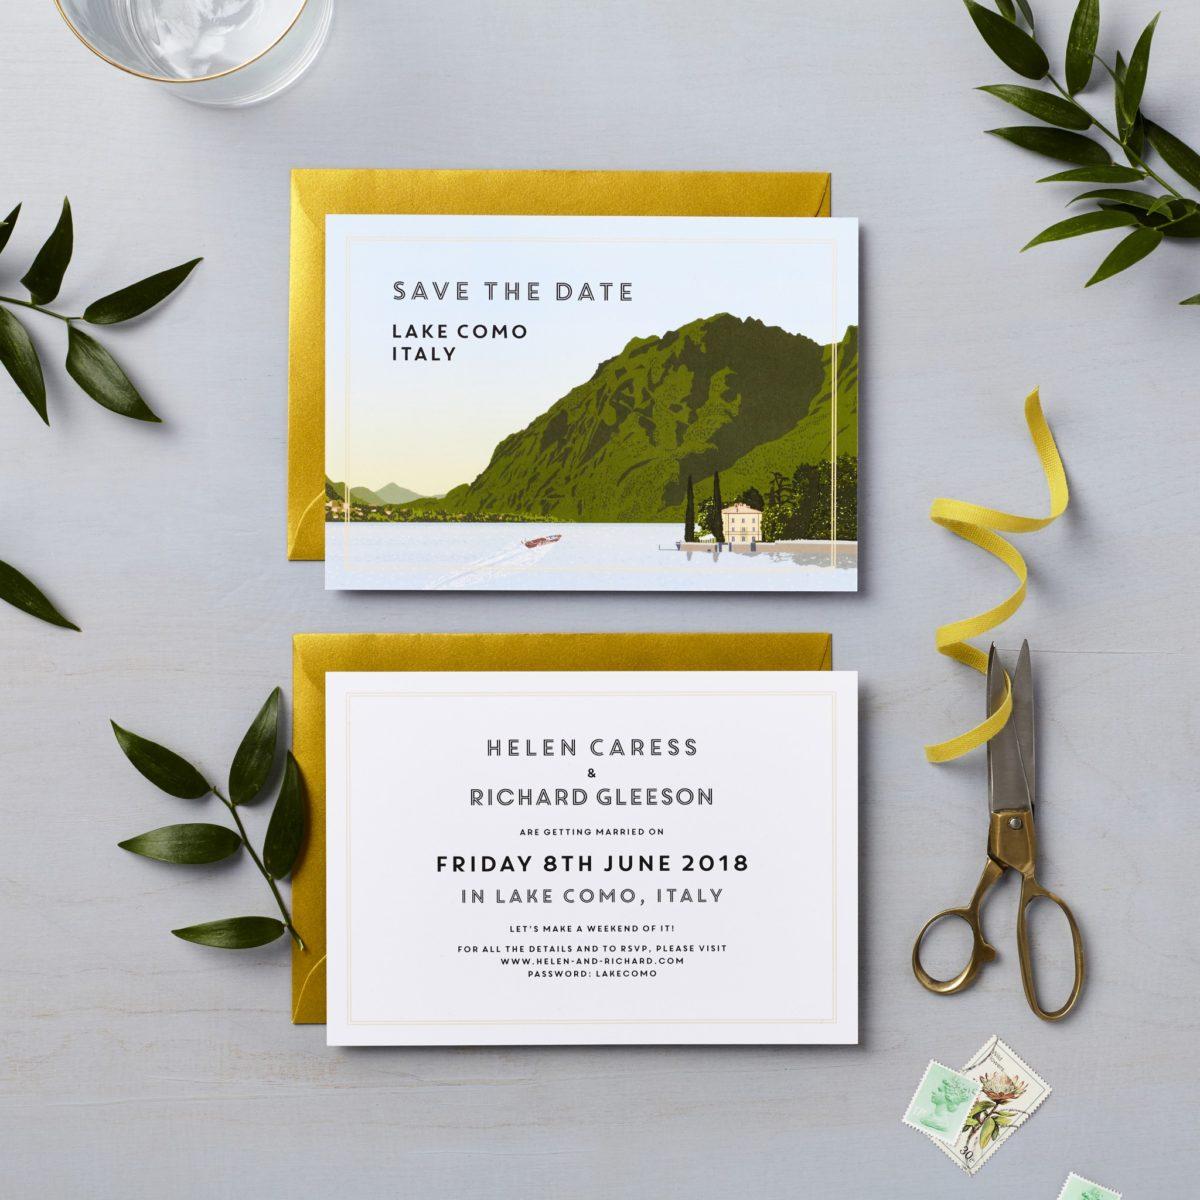 italy wedding lake como wedding invitation save the date vintage travel postcard design Villa Aura del Lago